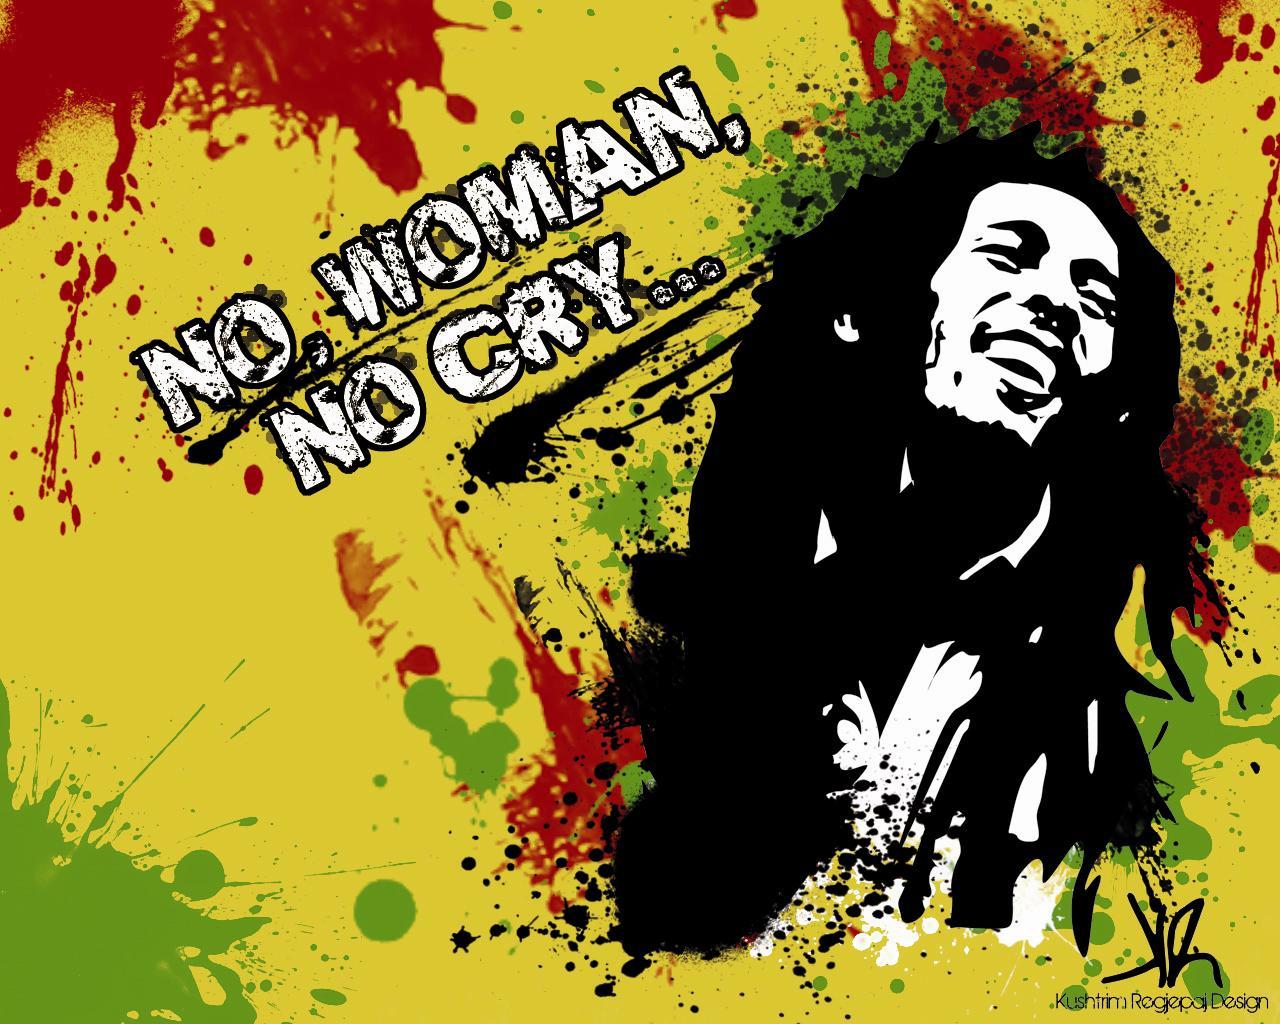 Bob Marley Wallpaper v.2 by ~Kushtrim on deviantART